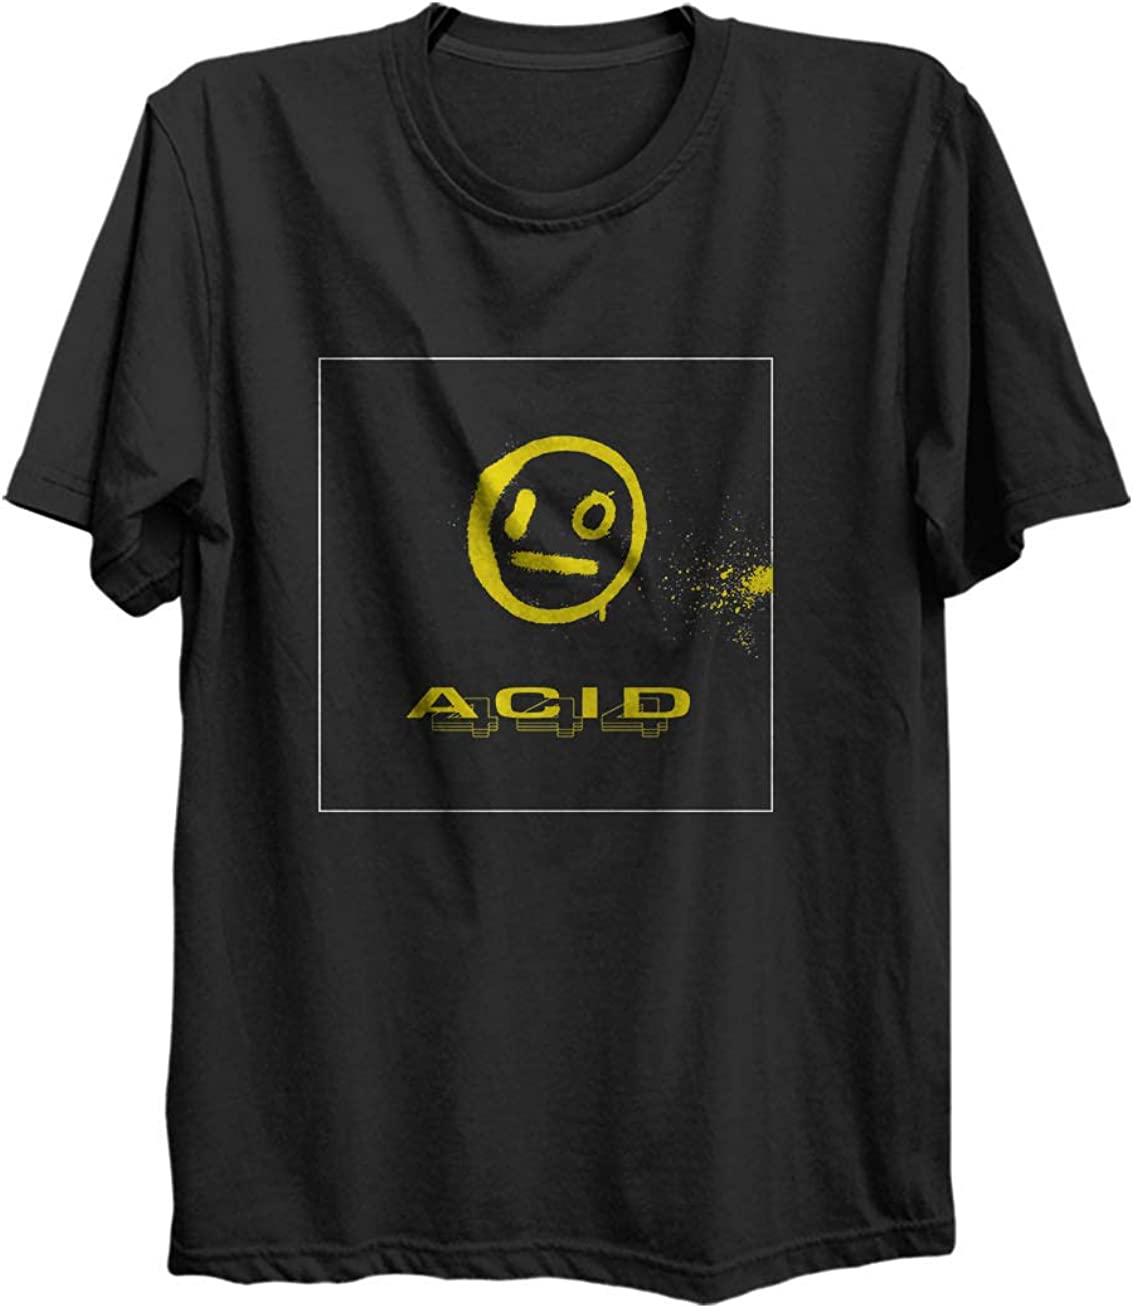 amazon com i o merch merchadise logo acid 444 cool shirt long sleeve crewneck sweatshirt hoodie sweatshirt for kids men women black clothing i o merch merchadise logo acid 444